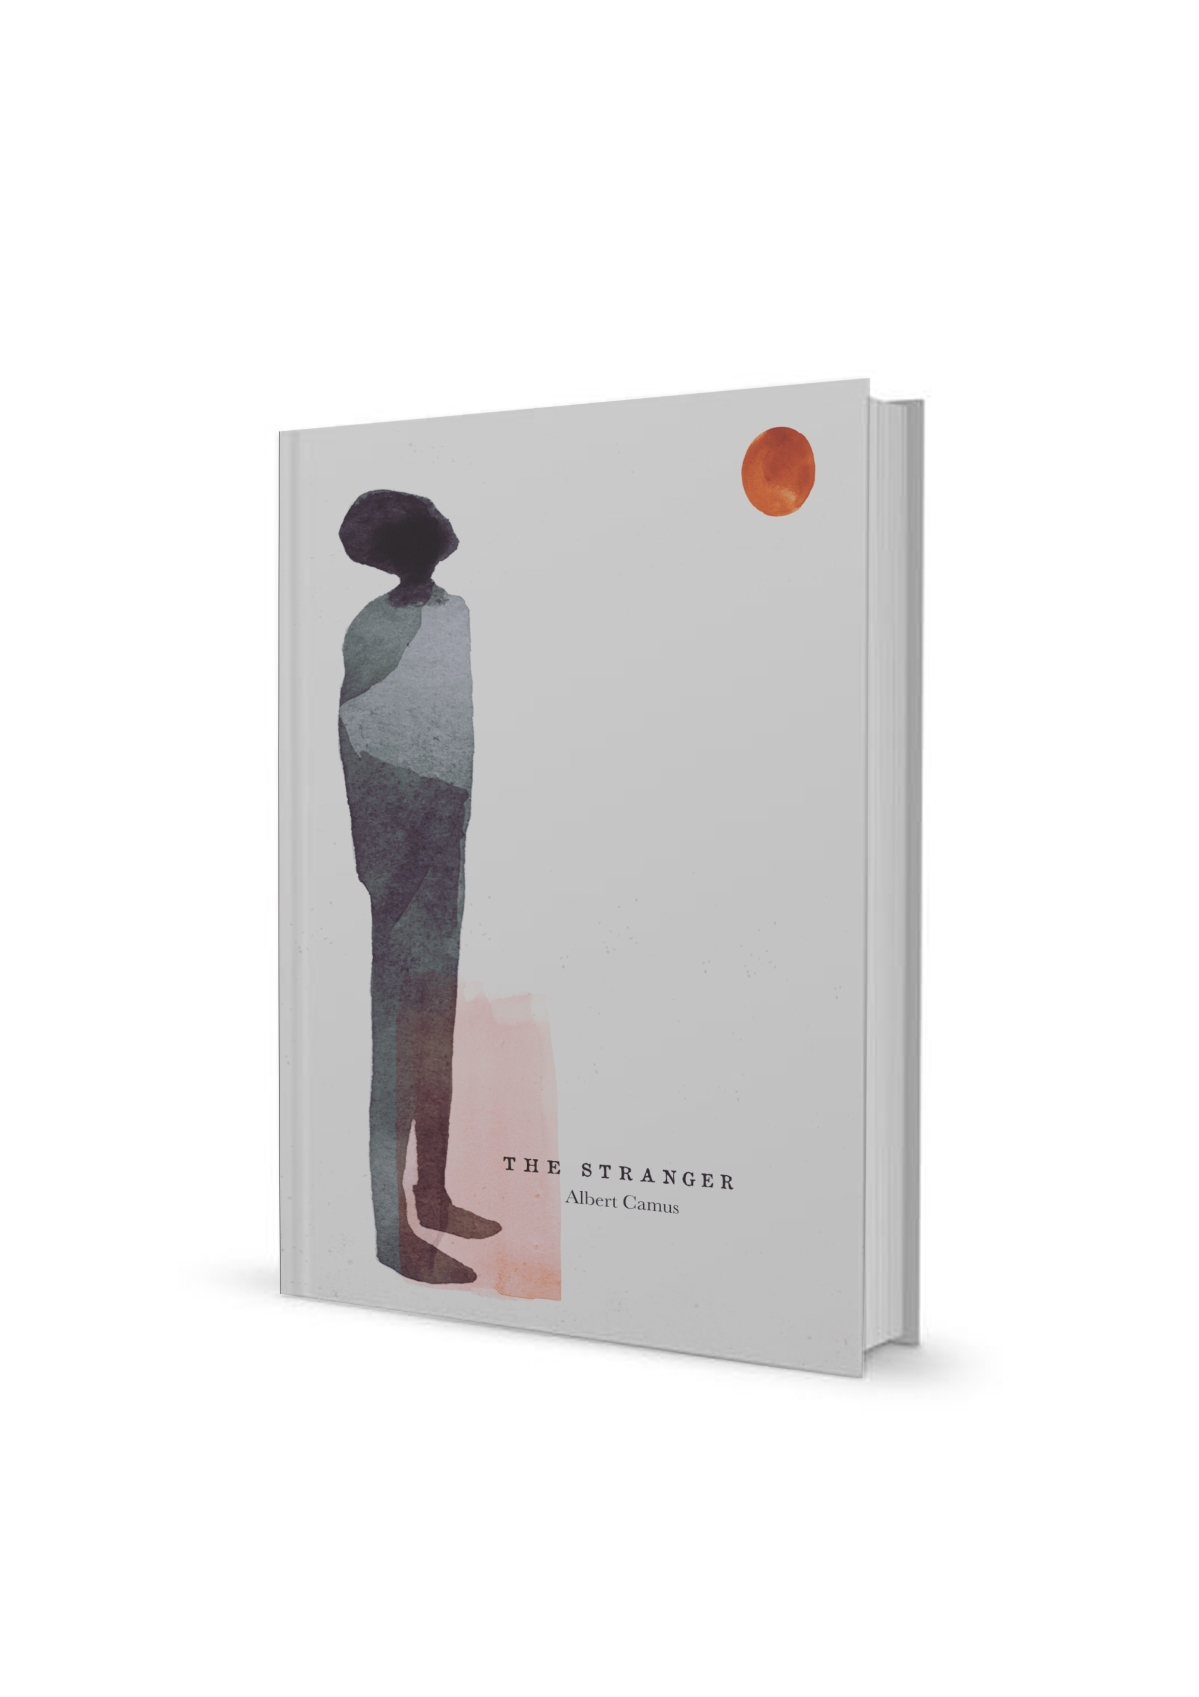 joannalayla_letranger_bookcover_mockup_2